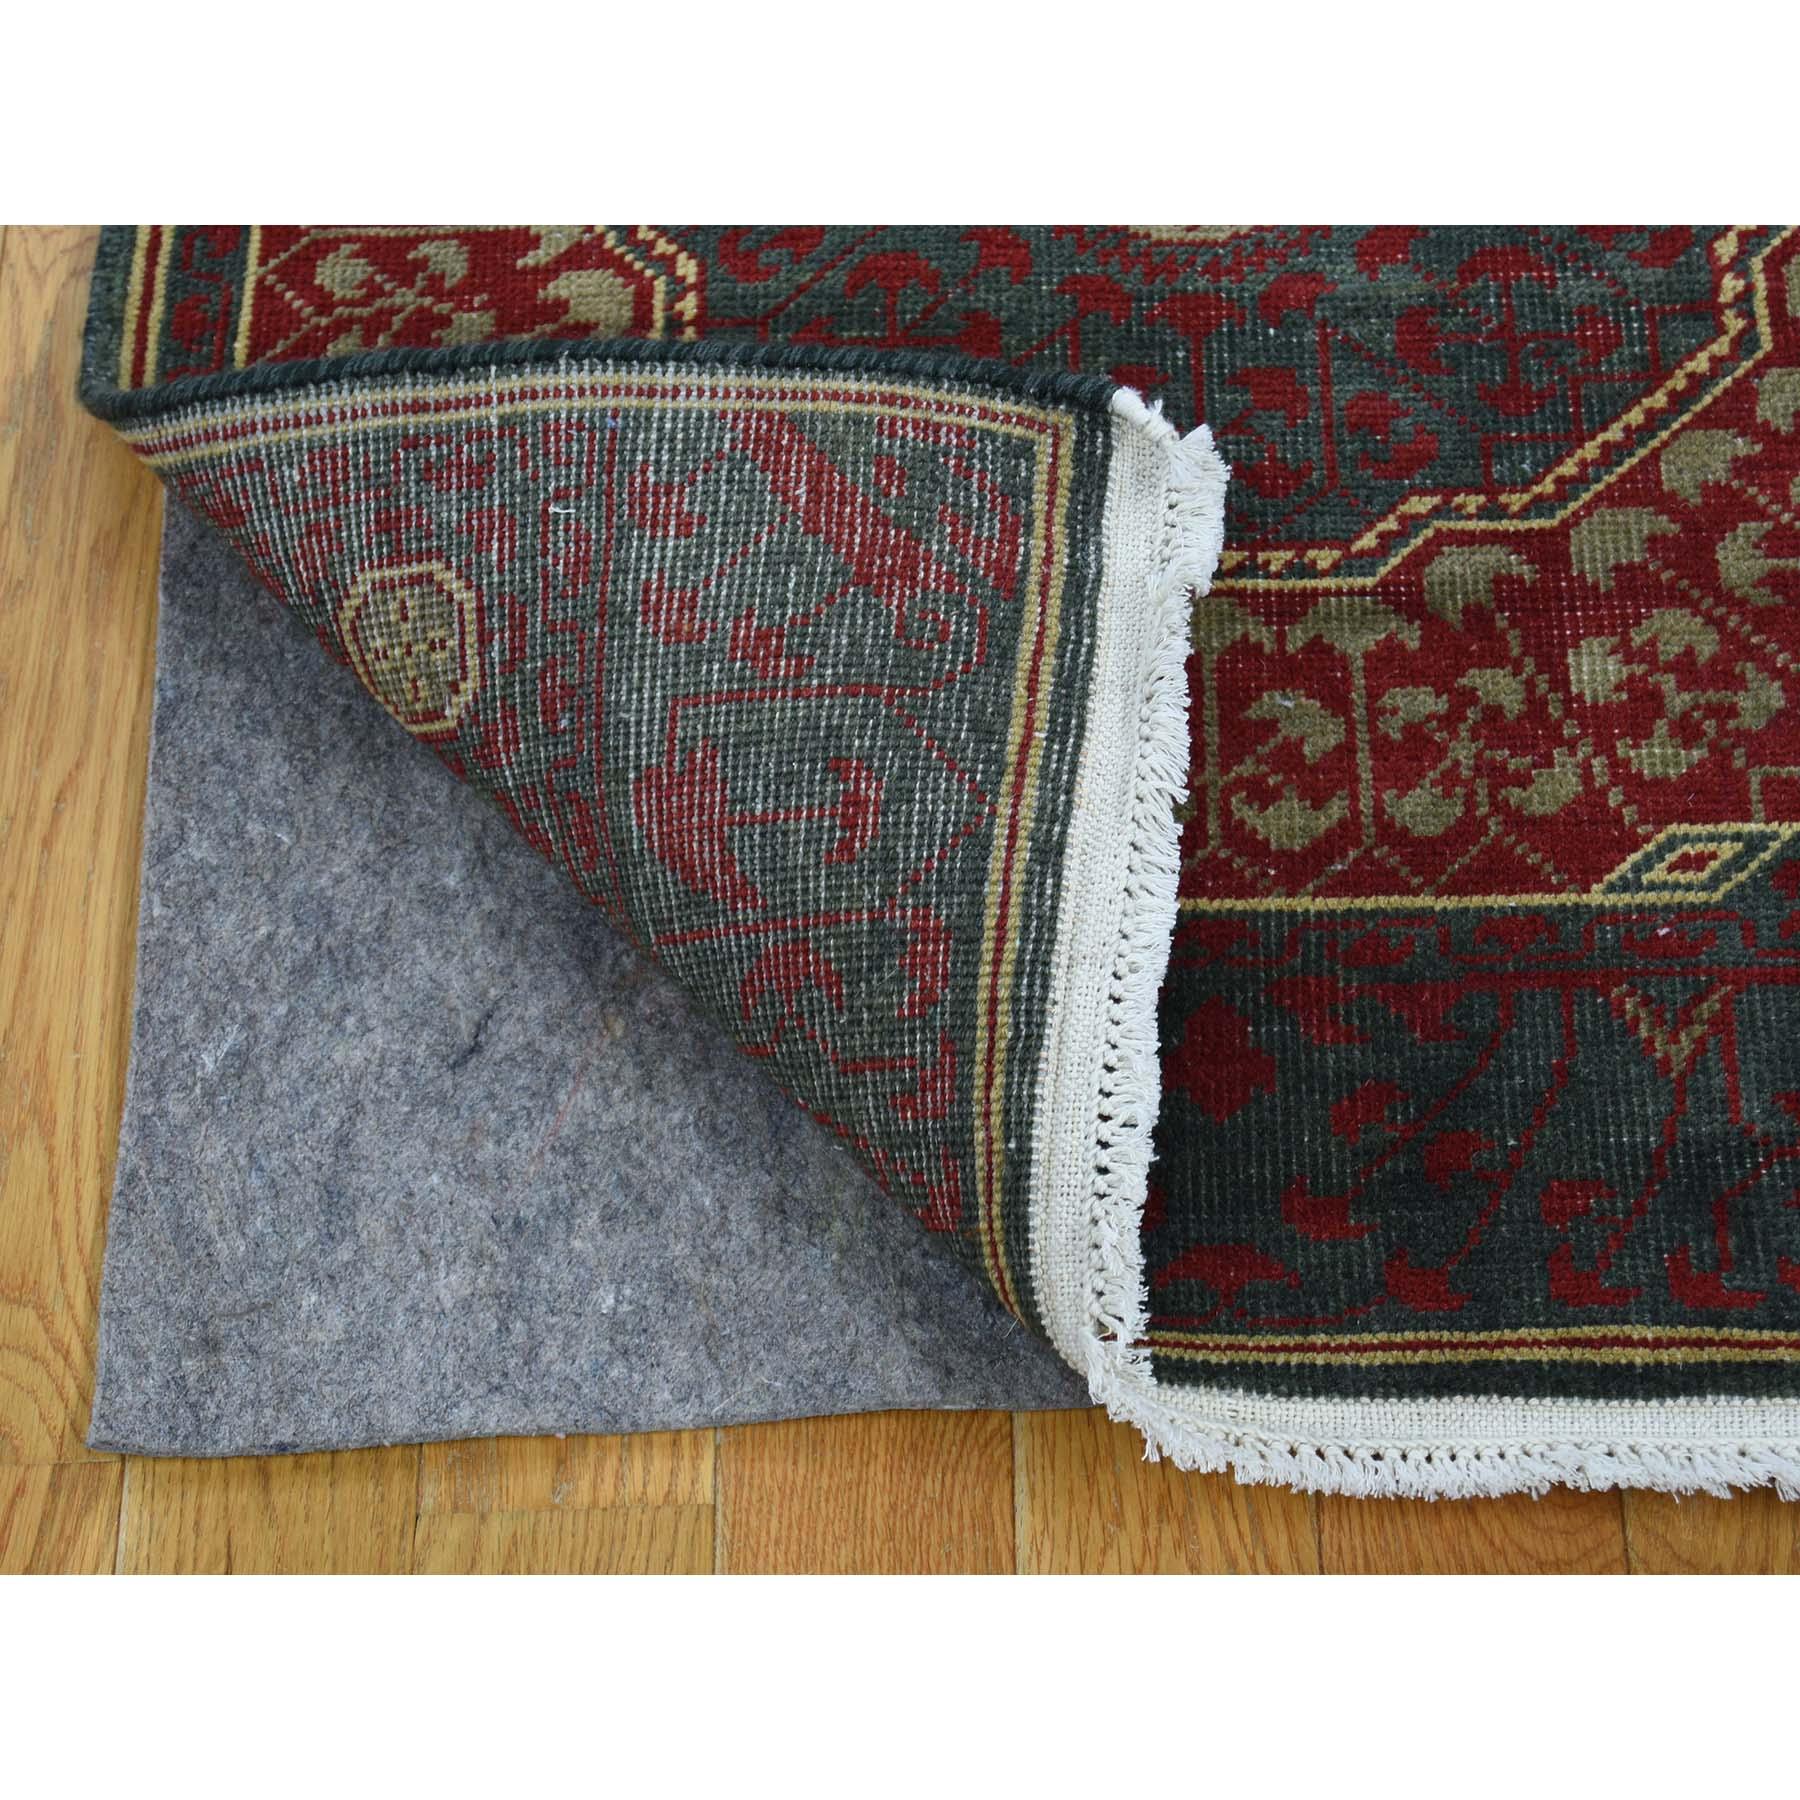 25X82 Vintage Look Mamluk Zero Pile Shaved Low Worn Wool